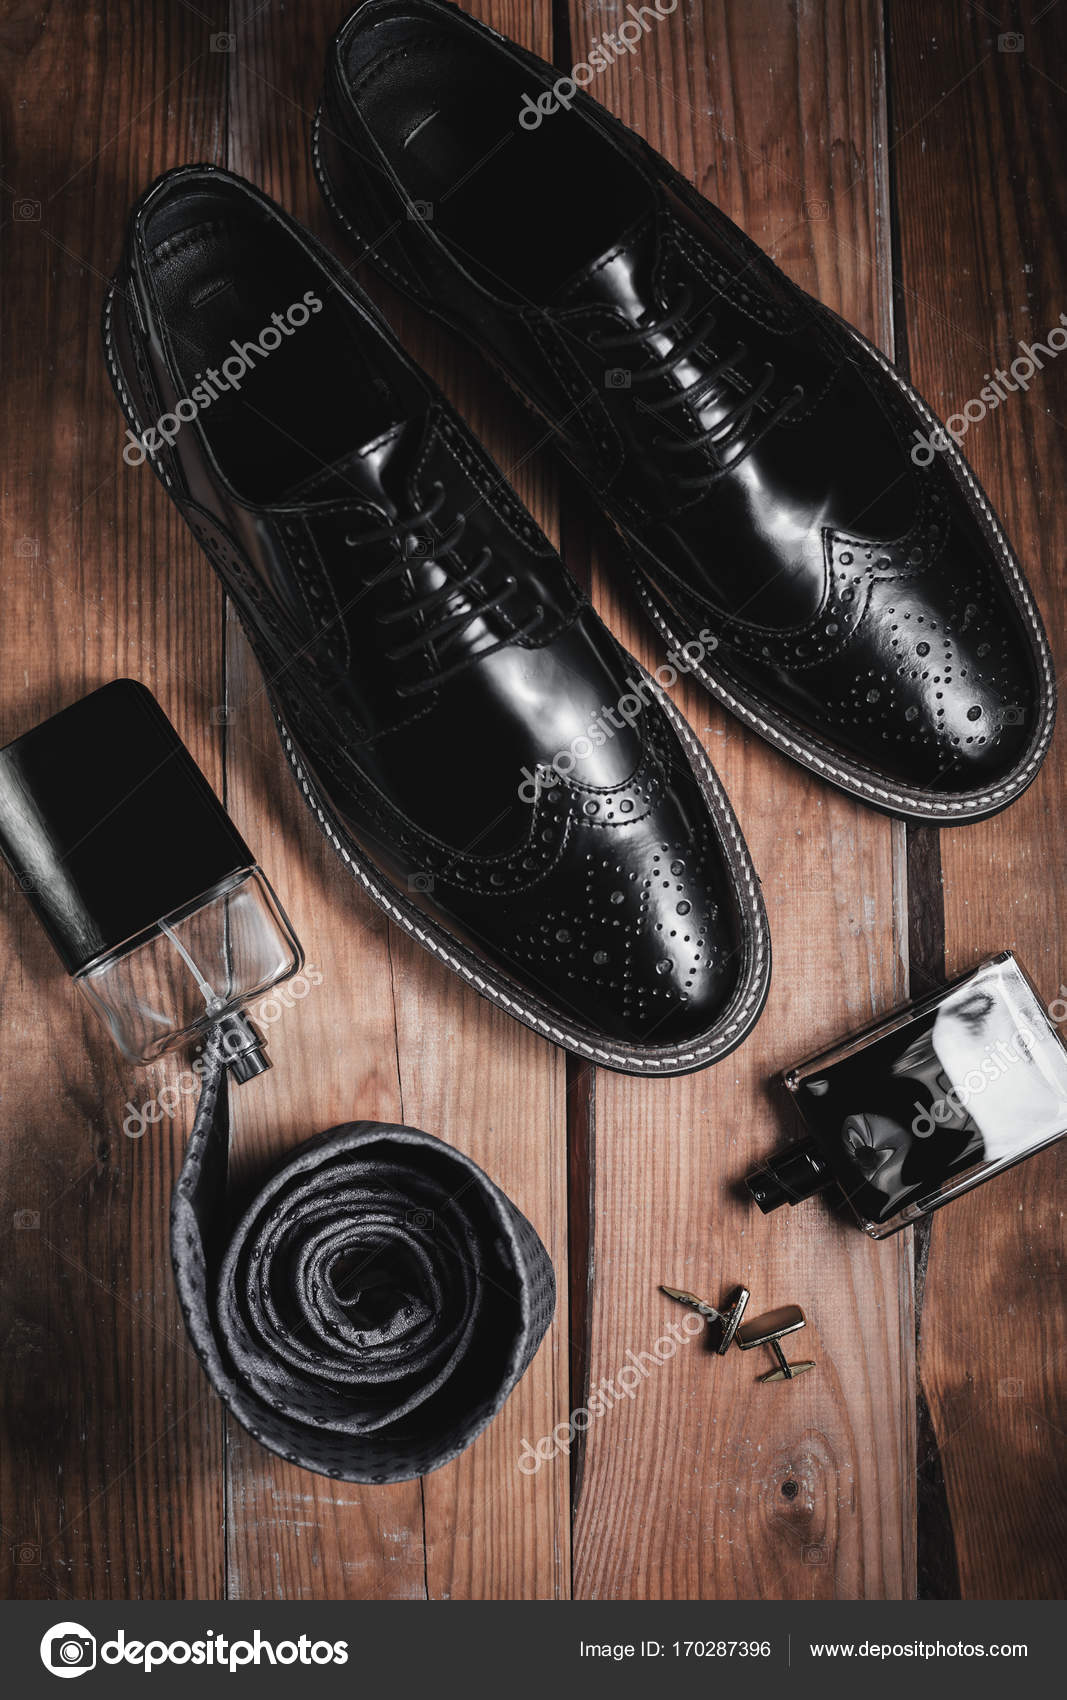 b6ed65127e0 Ανδρικά αξεσουάρ μόδας: παπούτσια με περιχειρίδα και άρωμα– εικόνα αρχείου